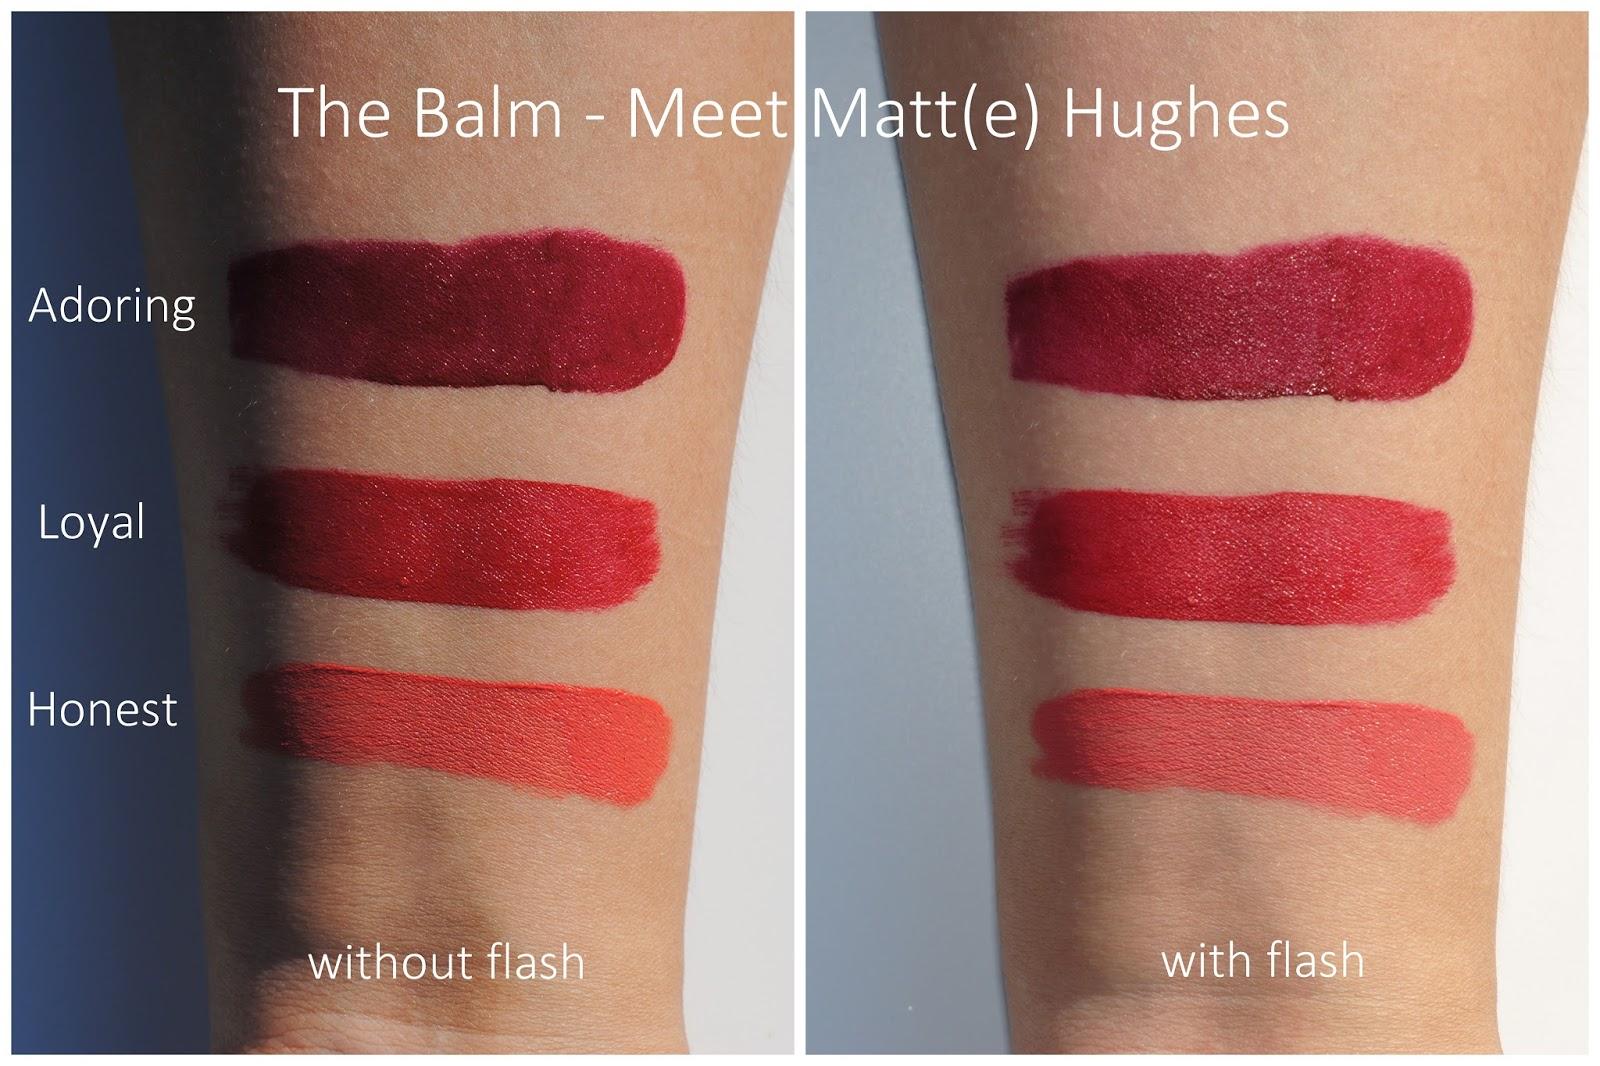 thebalm meet matte hughes lip color loyal